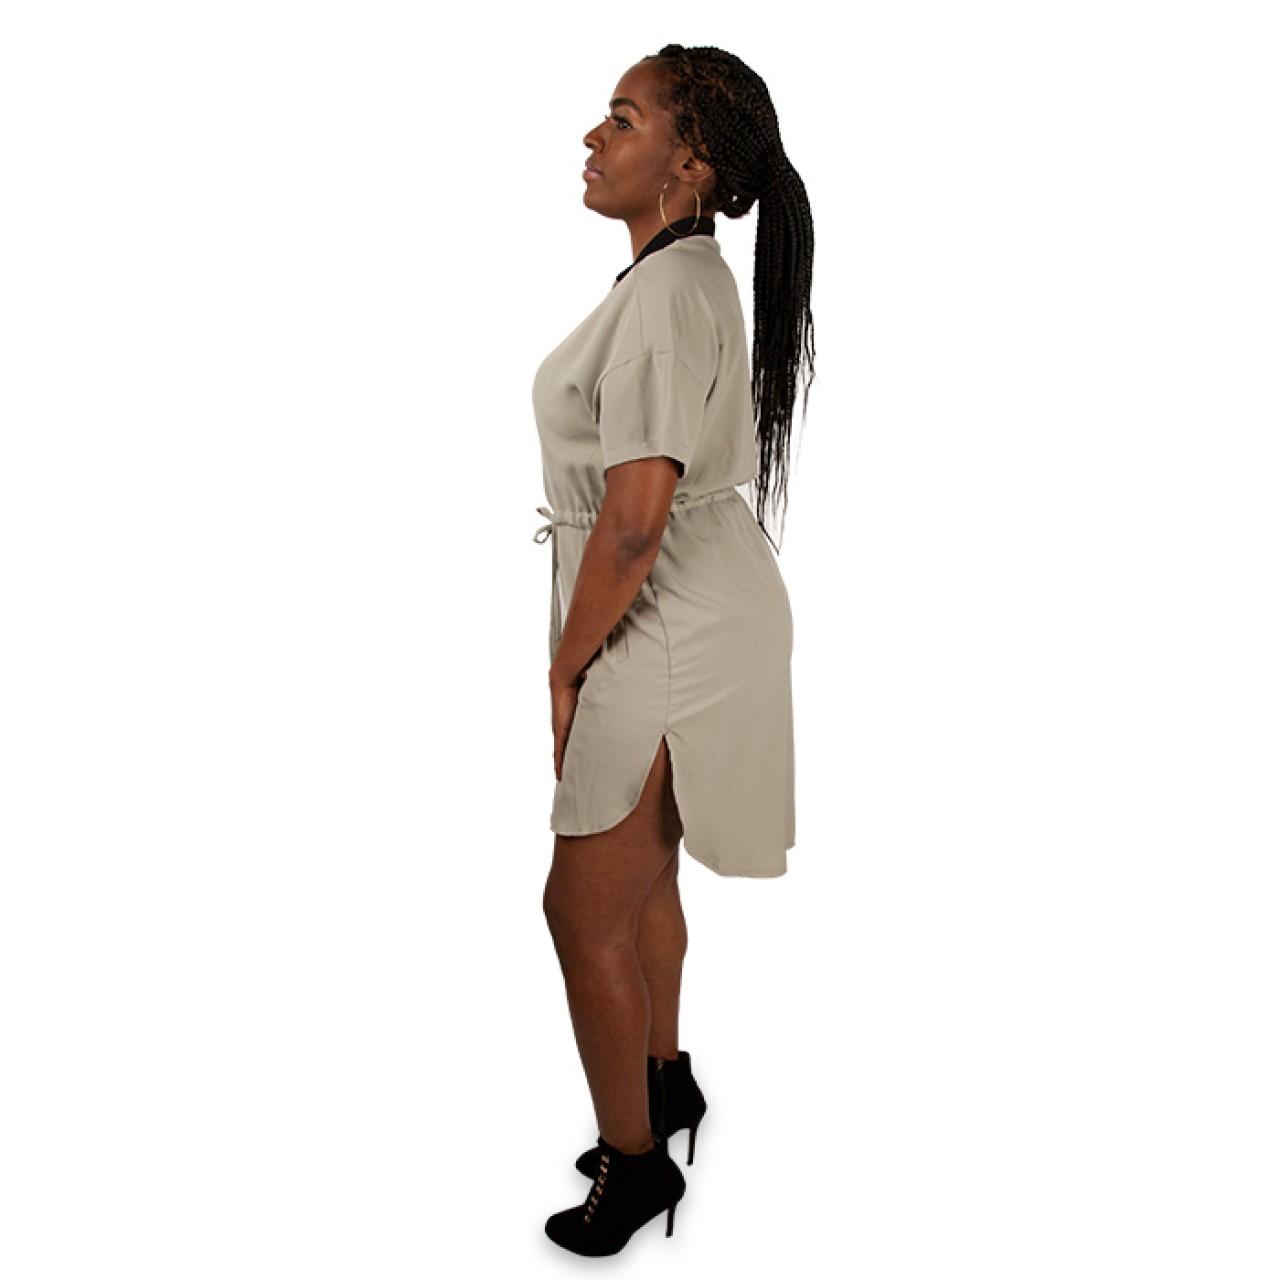 Women Sleeve Wrap Dress with designer cut at edges